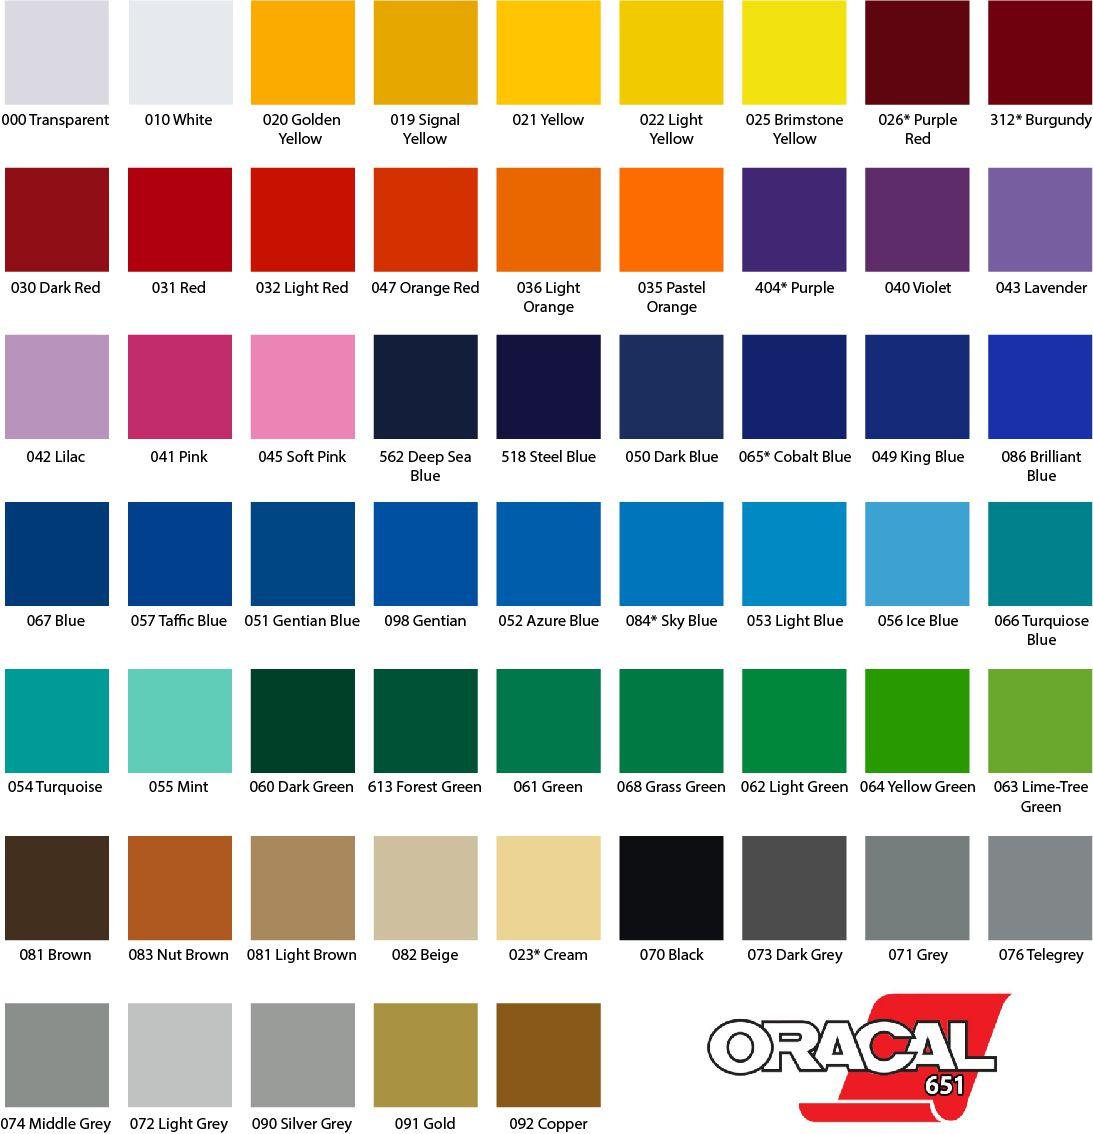 Adesivo Oracal 651 064 Yellow Green 1,26m x 1,00m